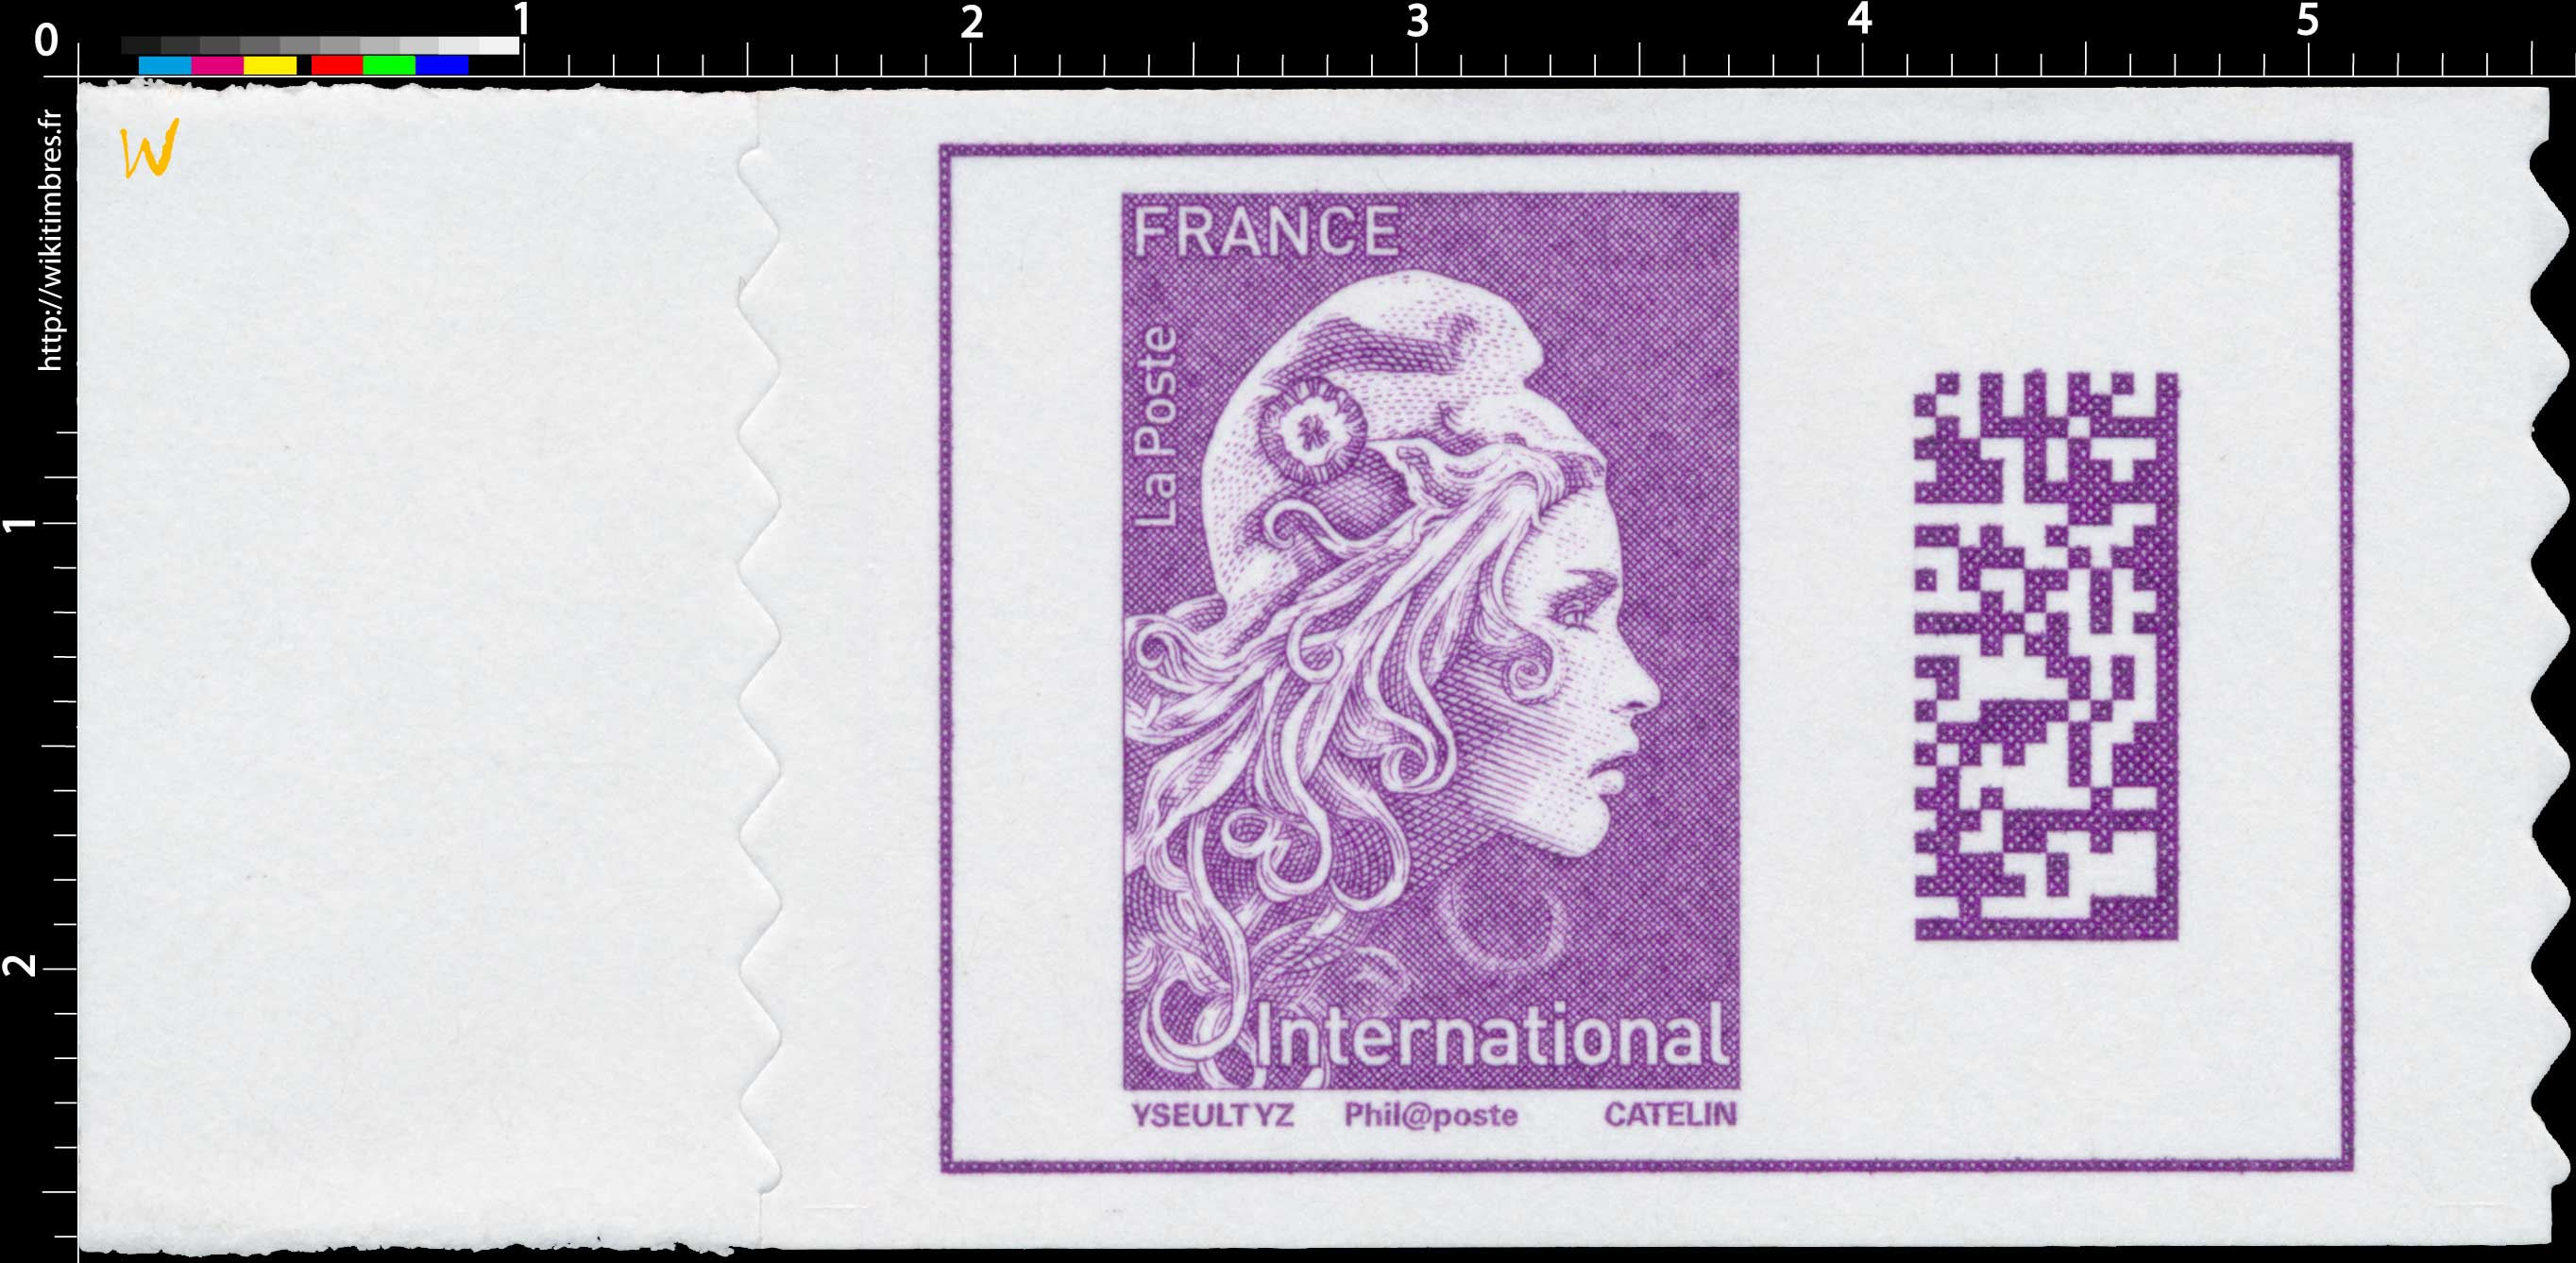 2019  Type Marianne l'engagée d'Yseult - International - Code Datamatrix